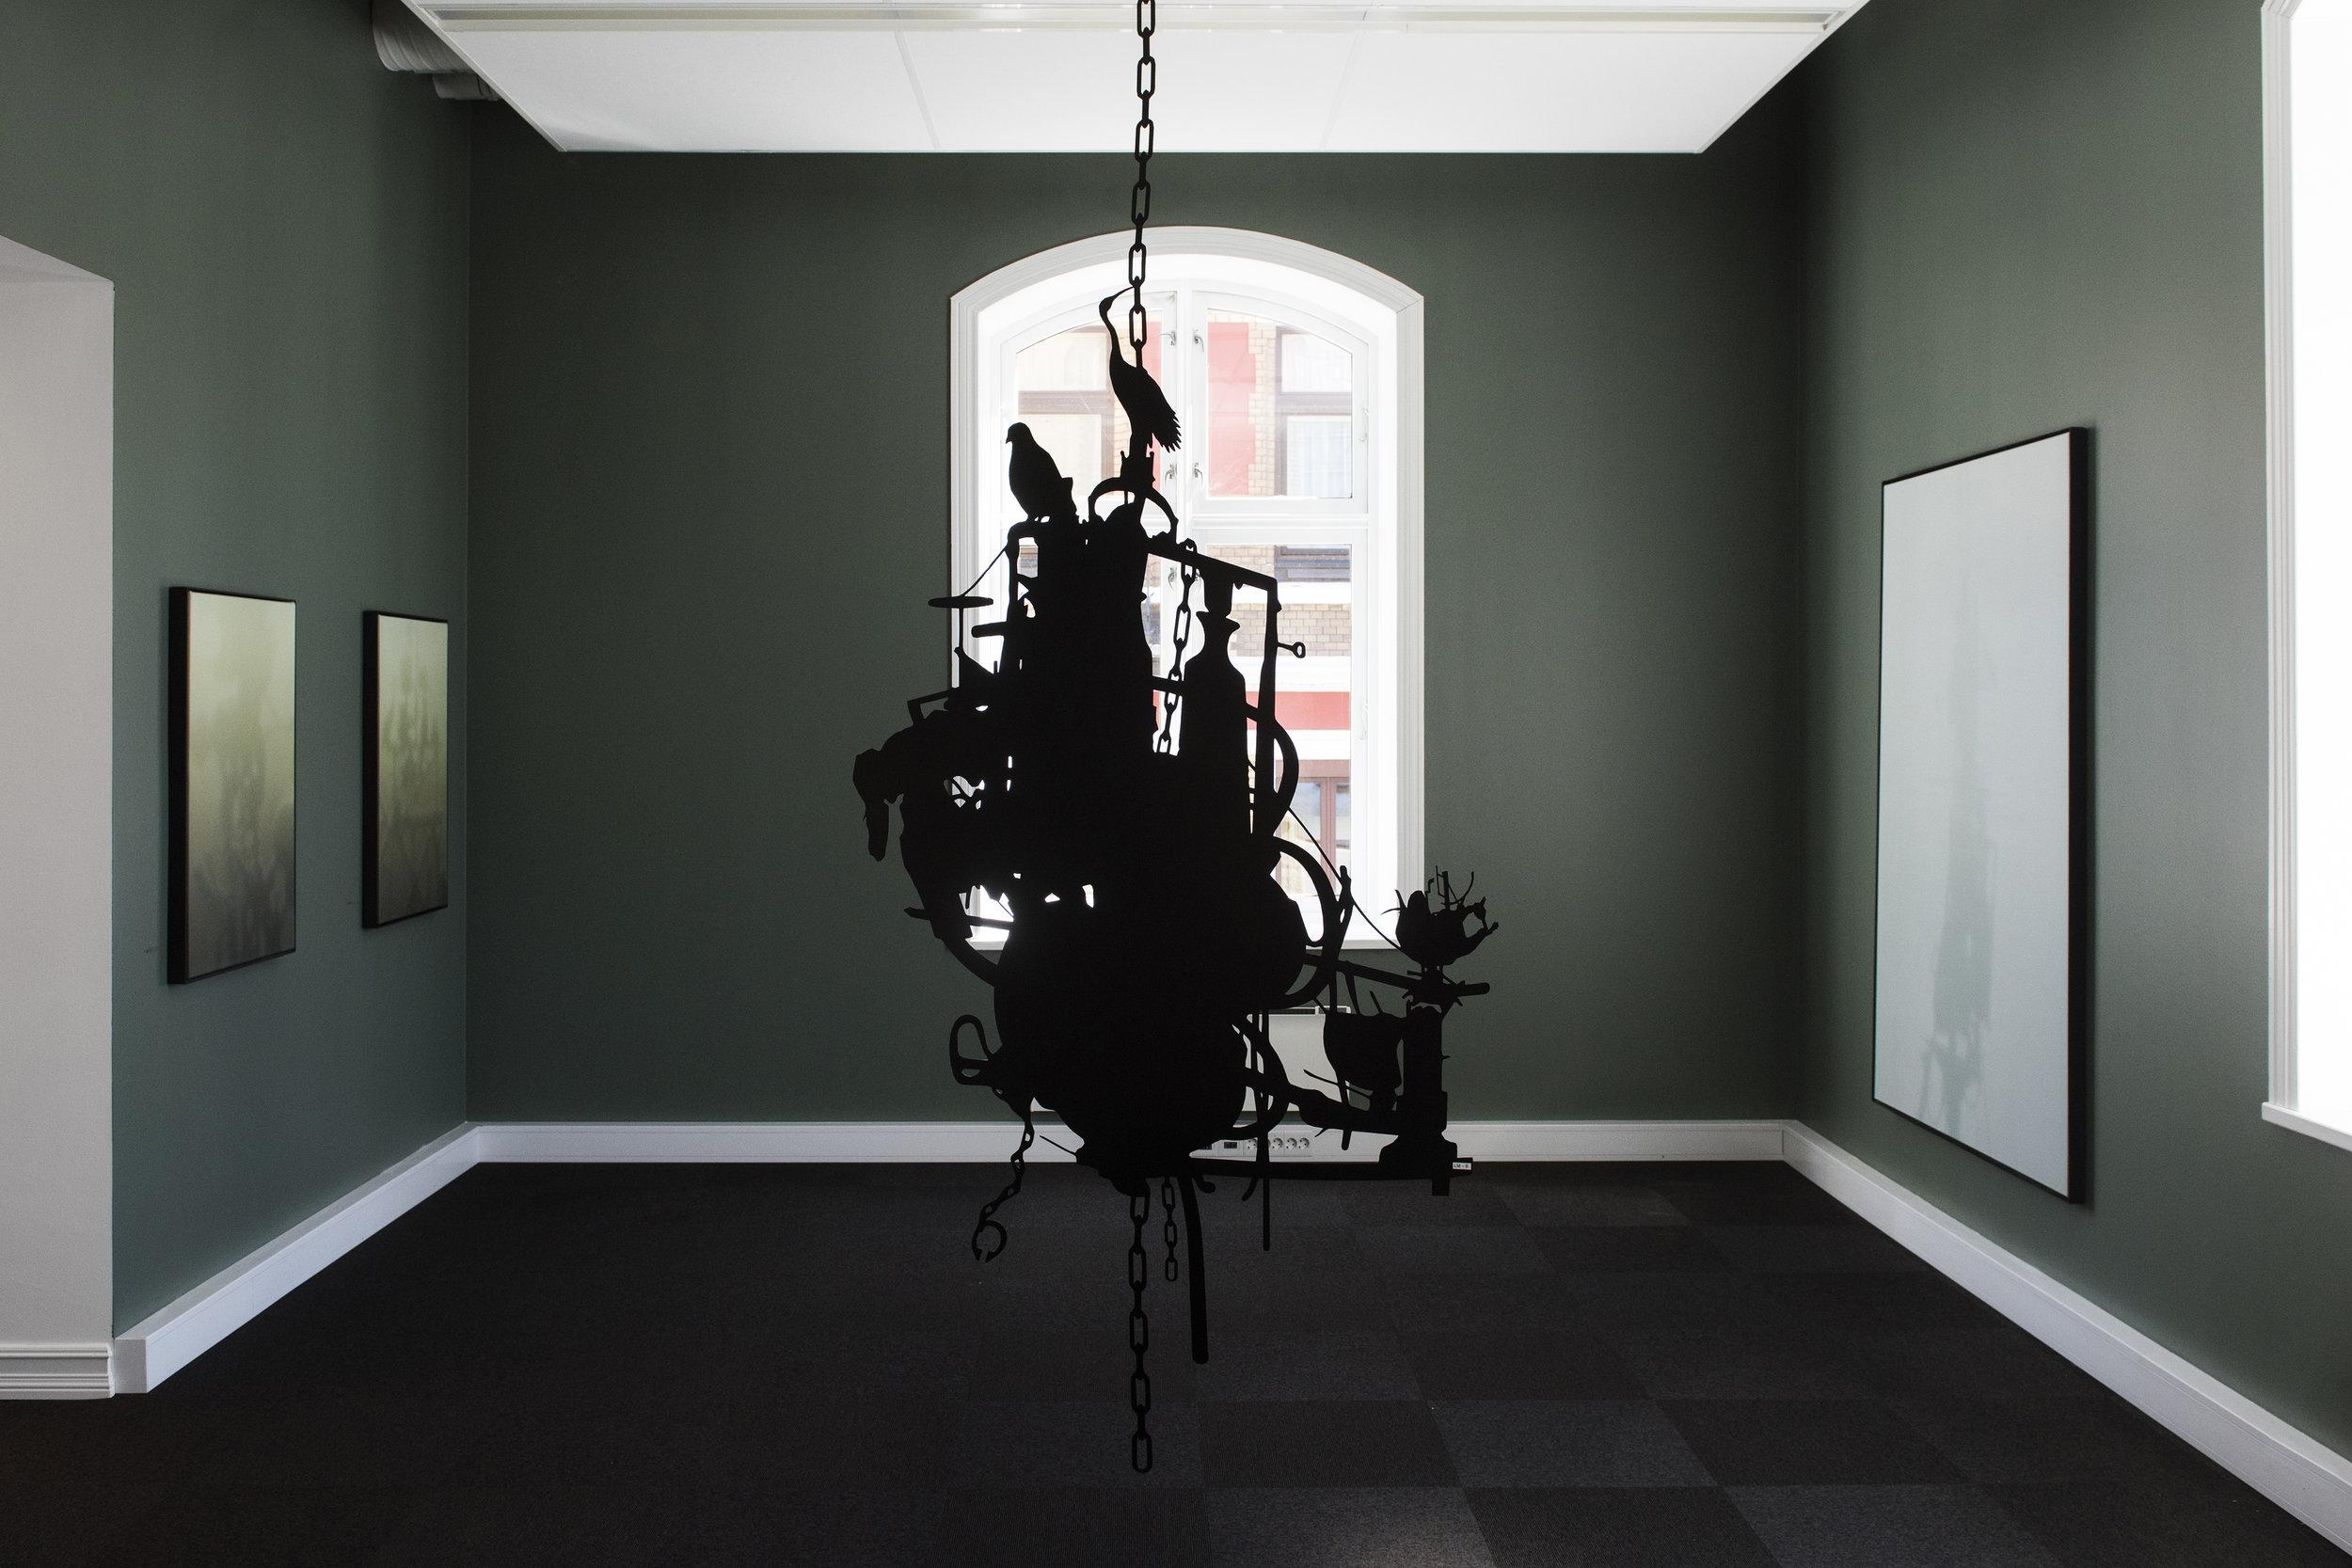 26.04 - 21.05.2017 «Mørkets muligheter» BGE contemporary art projects